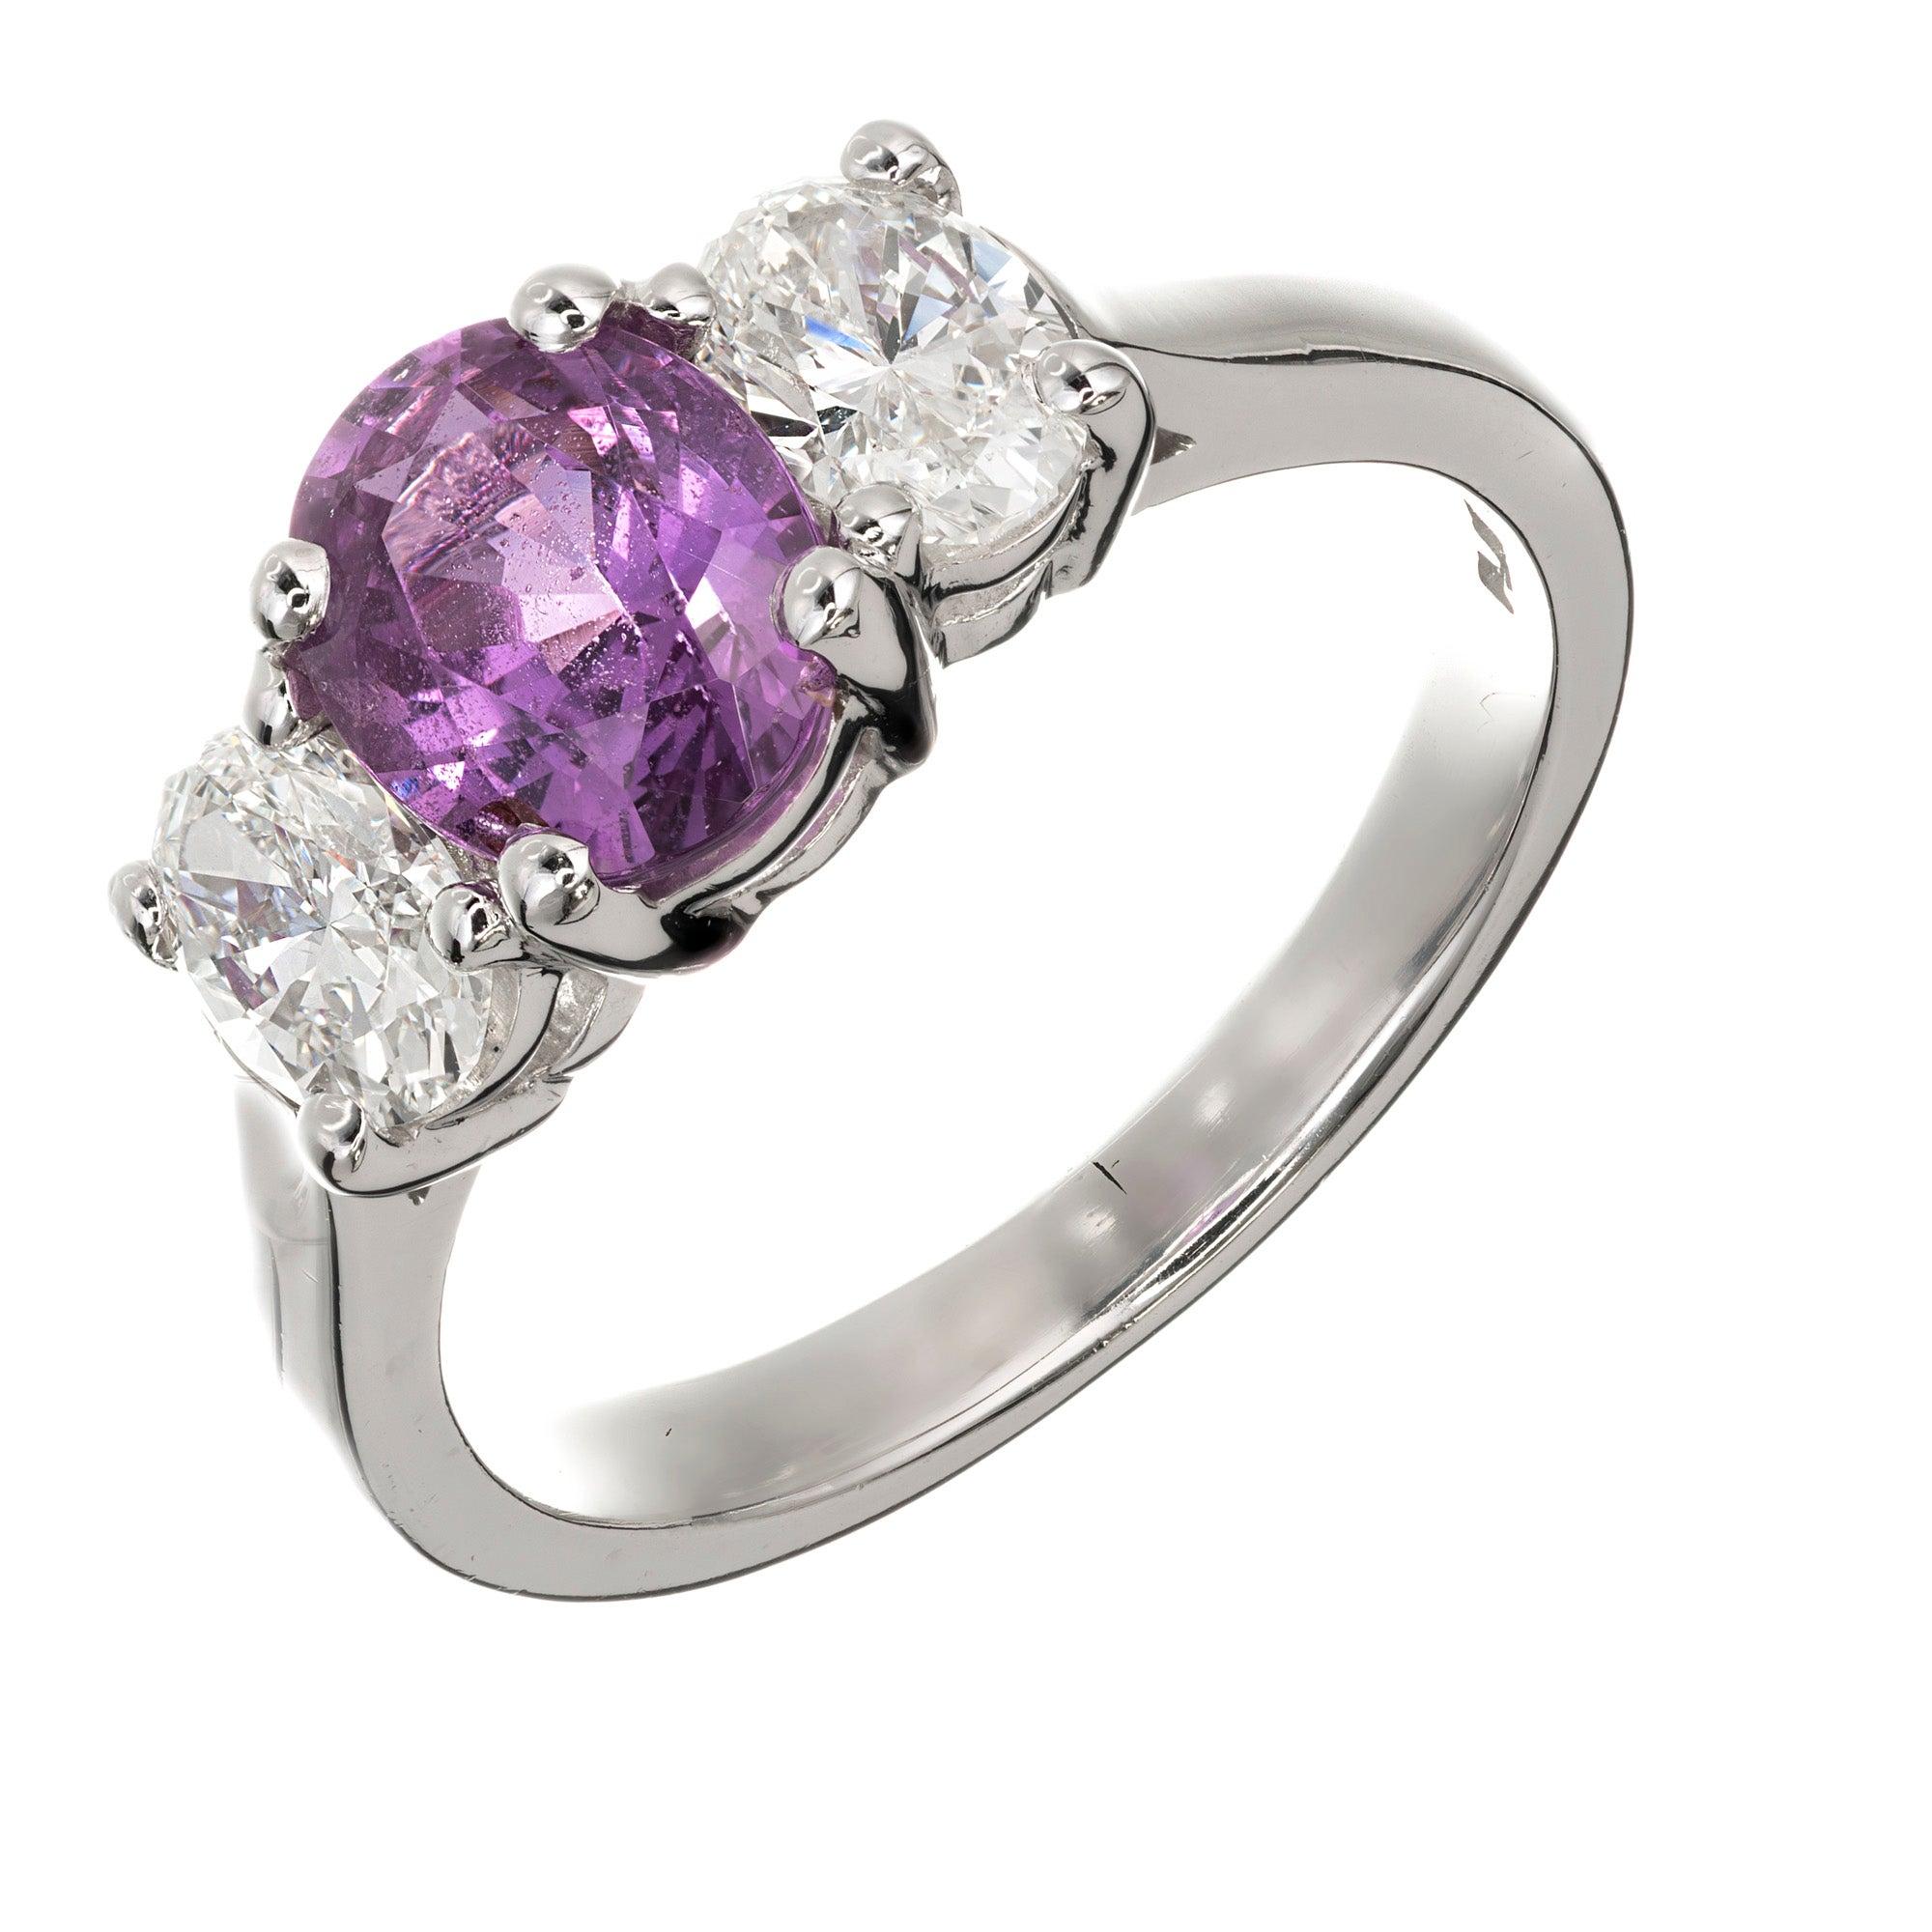 Peter Suchy GIA Certified Purple Pink Sapphire Diamond Platinum Engagement Ring